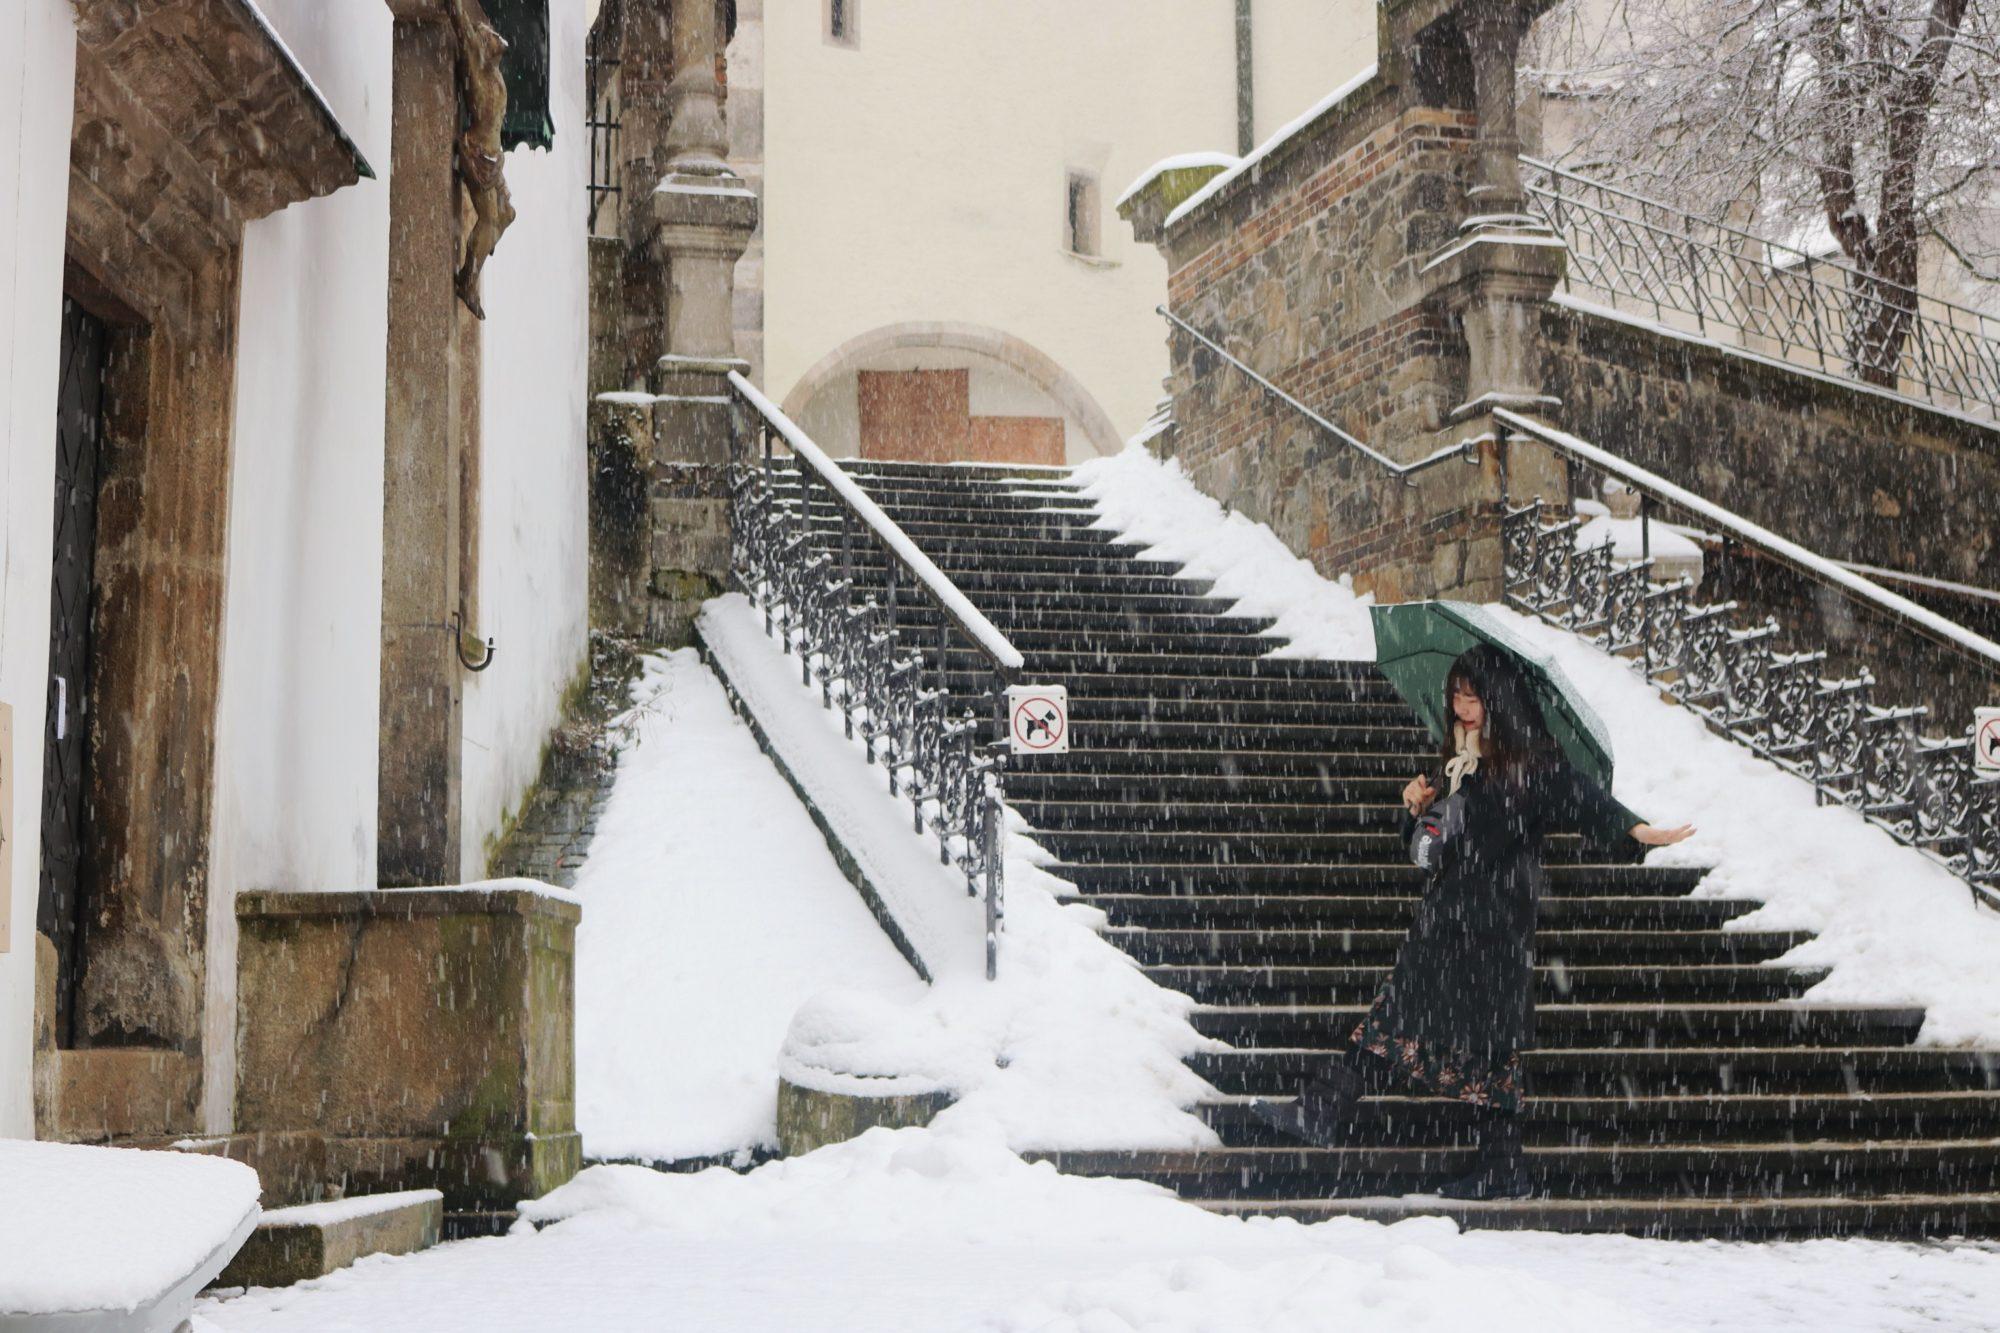 Český Krumlov, Winter Wonderlands To Visit